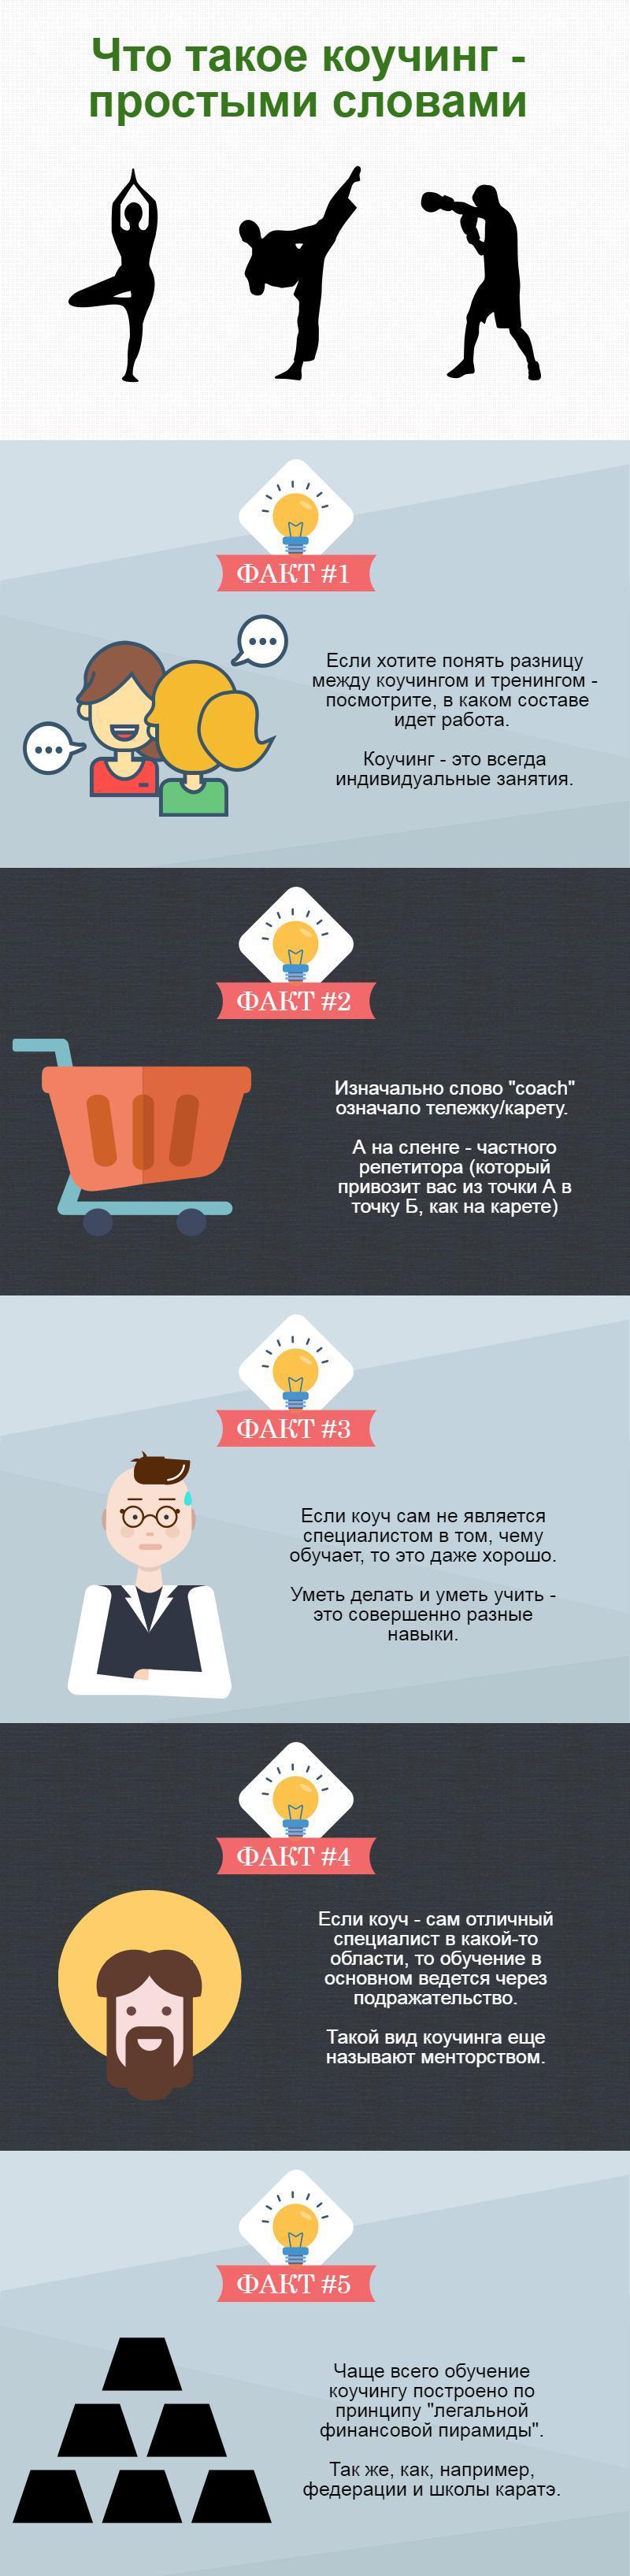 chto-takoe-kouching-infografic